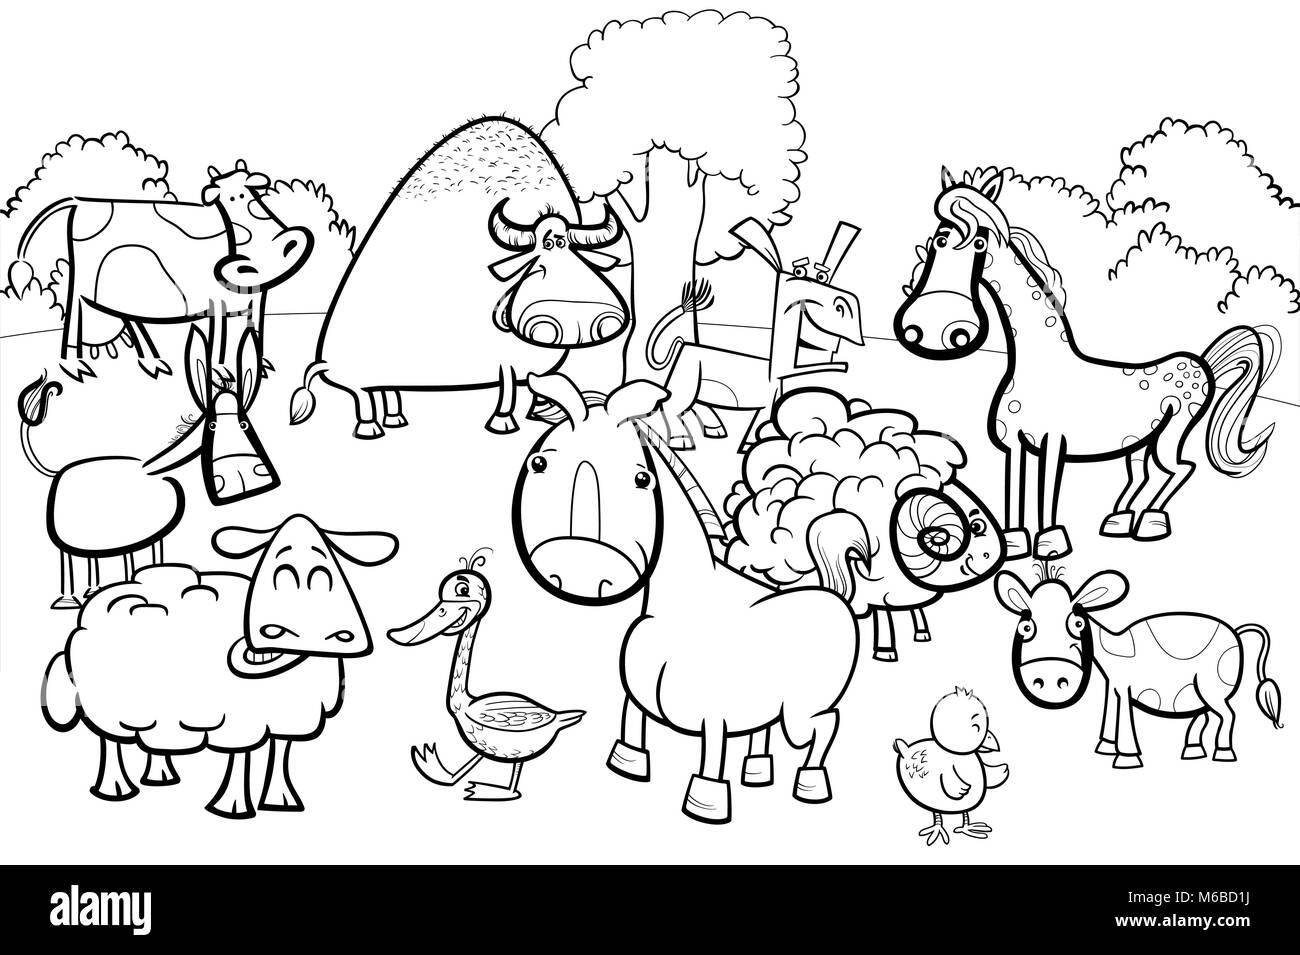 Black And White Cartoon Illustration Of Cute Farm Animal